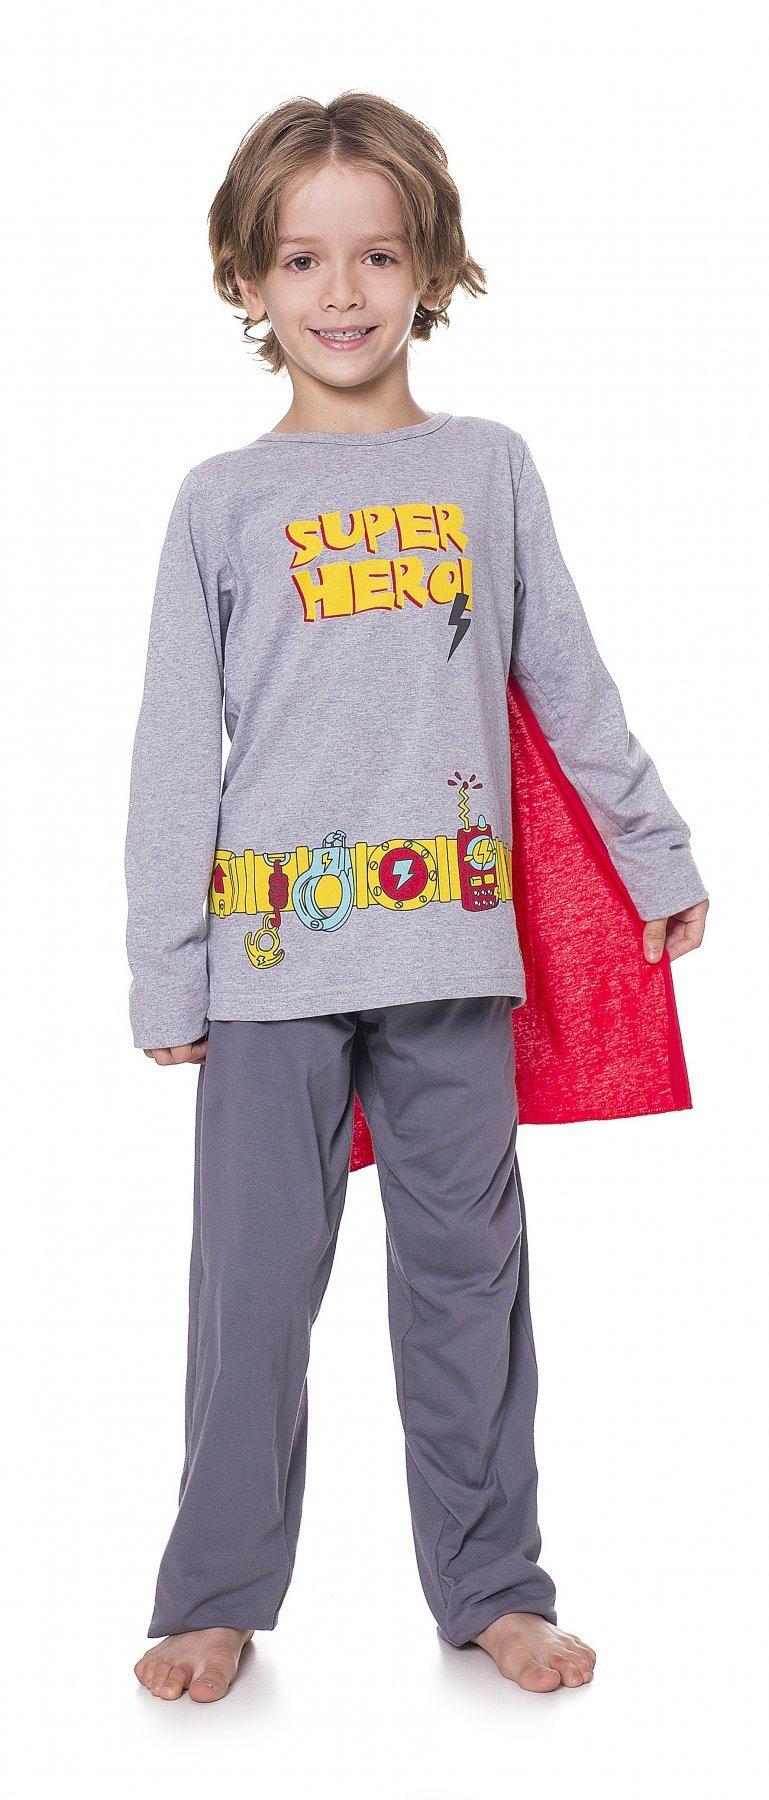 Pijama Infantil Meia Malha com Máscara Herói